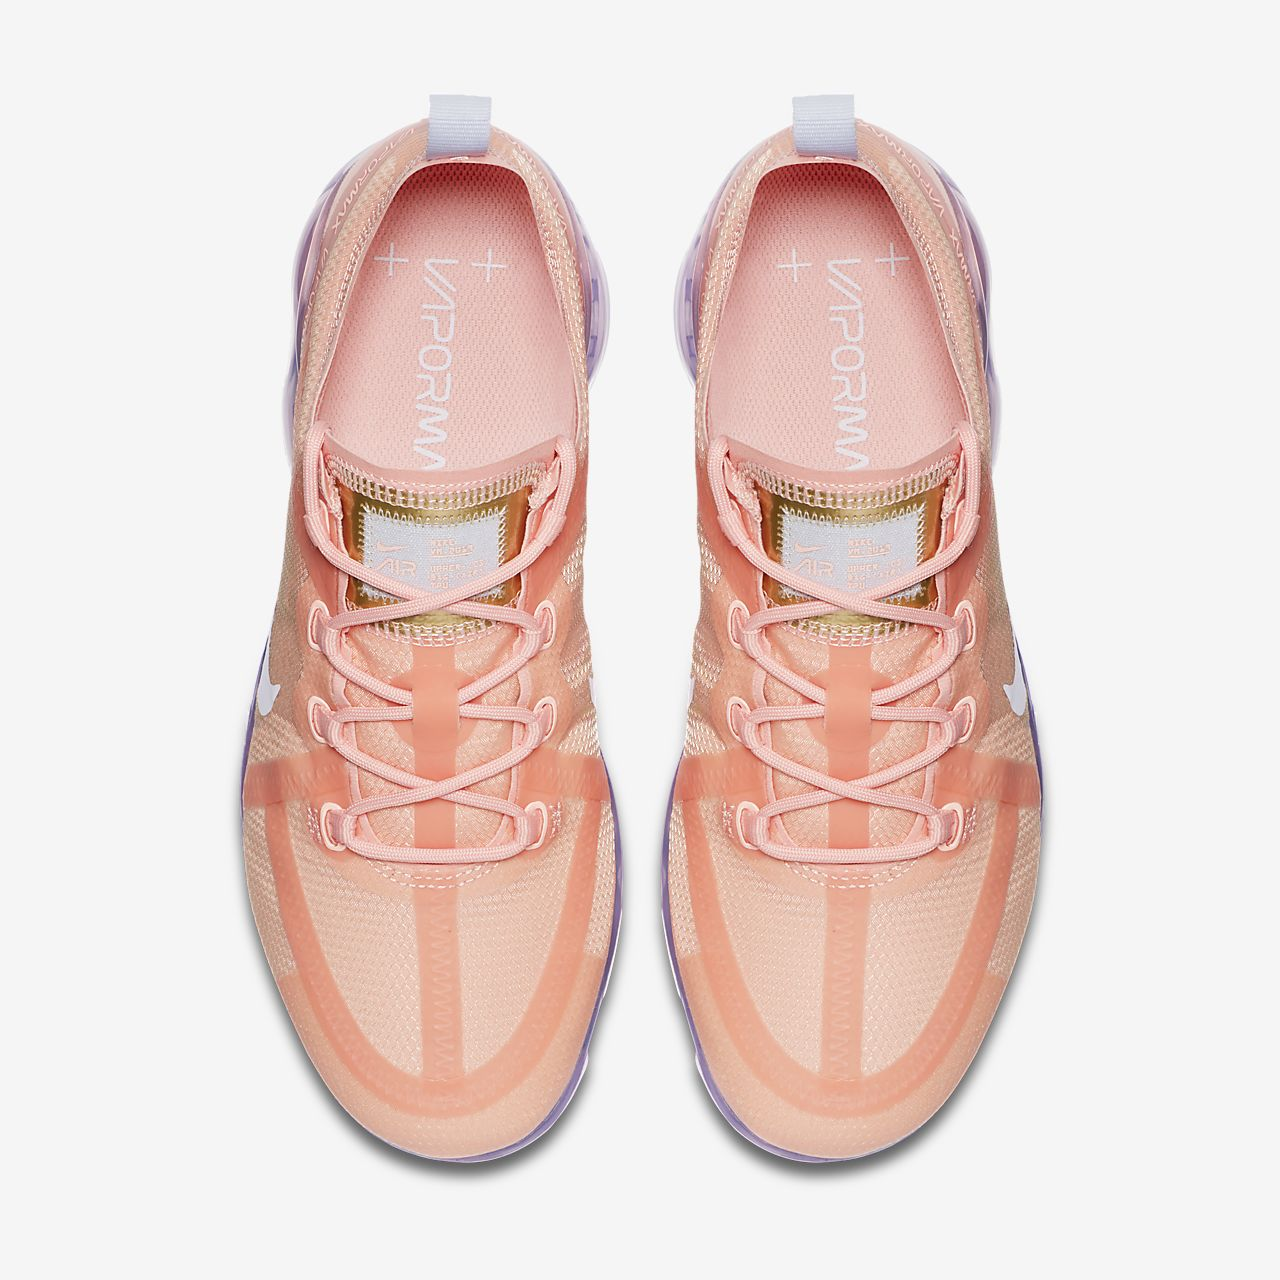 Scarpa Nike Air Vapormax 2019 Donna Rosa